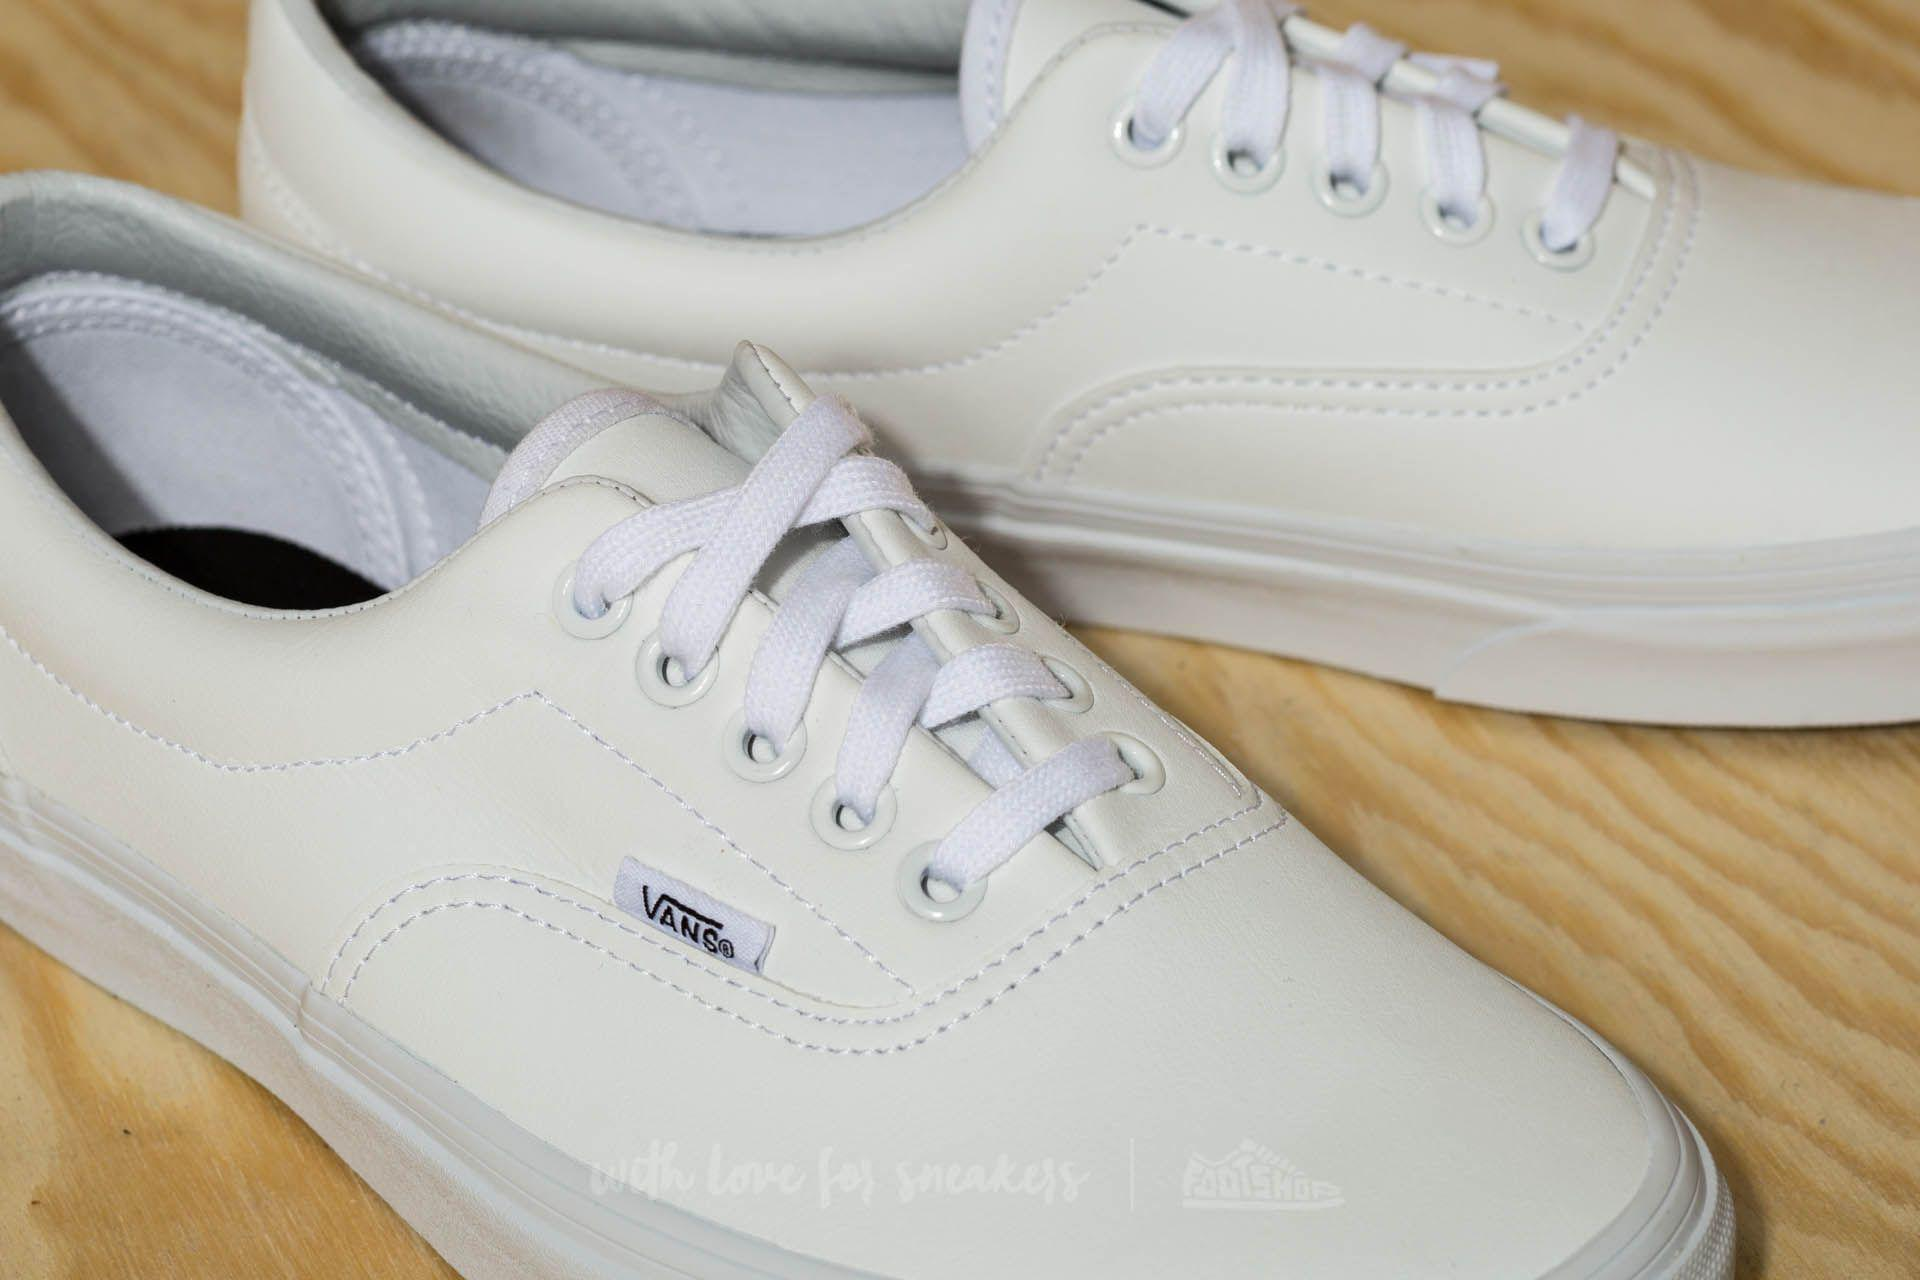 Lyst - Vans Era (classic Tumble) True White in White for Men 8adfde51d